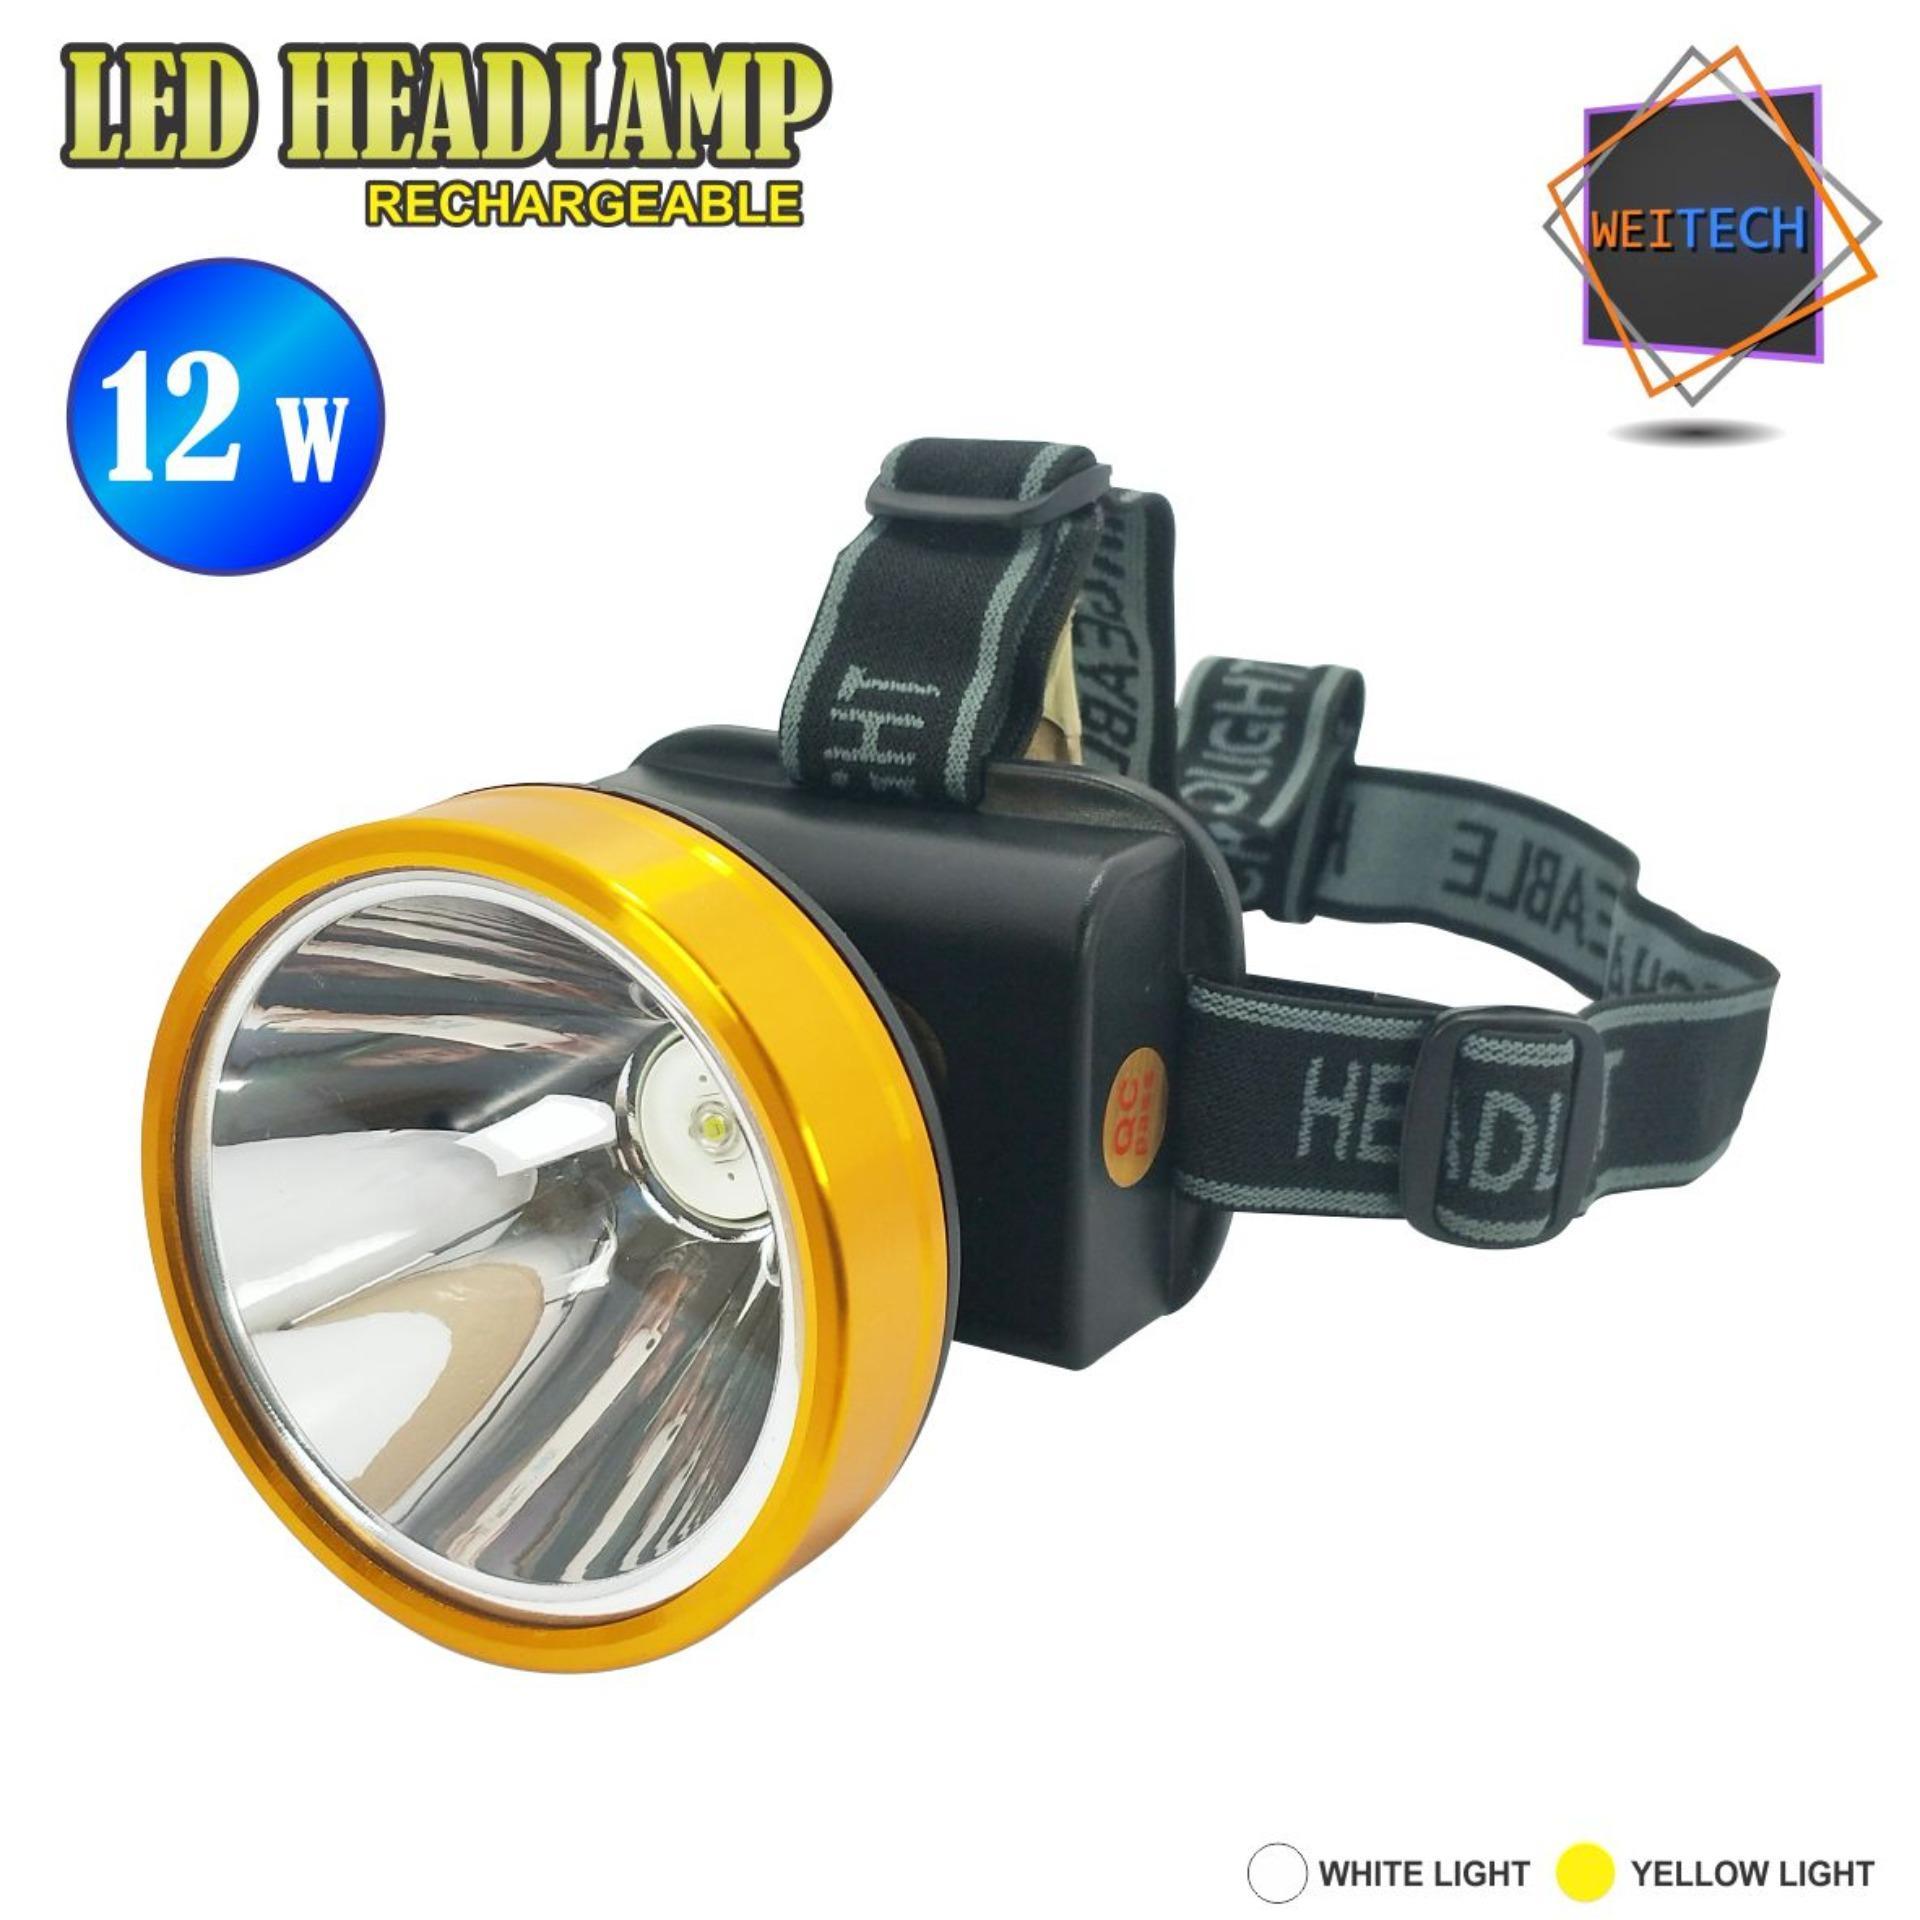 Harga Weitech Rechargeable Headlamp Lampu Kepala Ak Fl 103 12W Yang Bagus